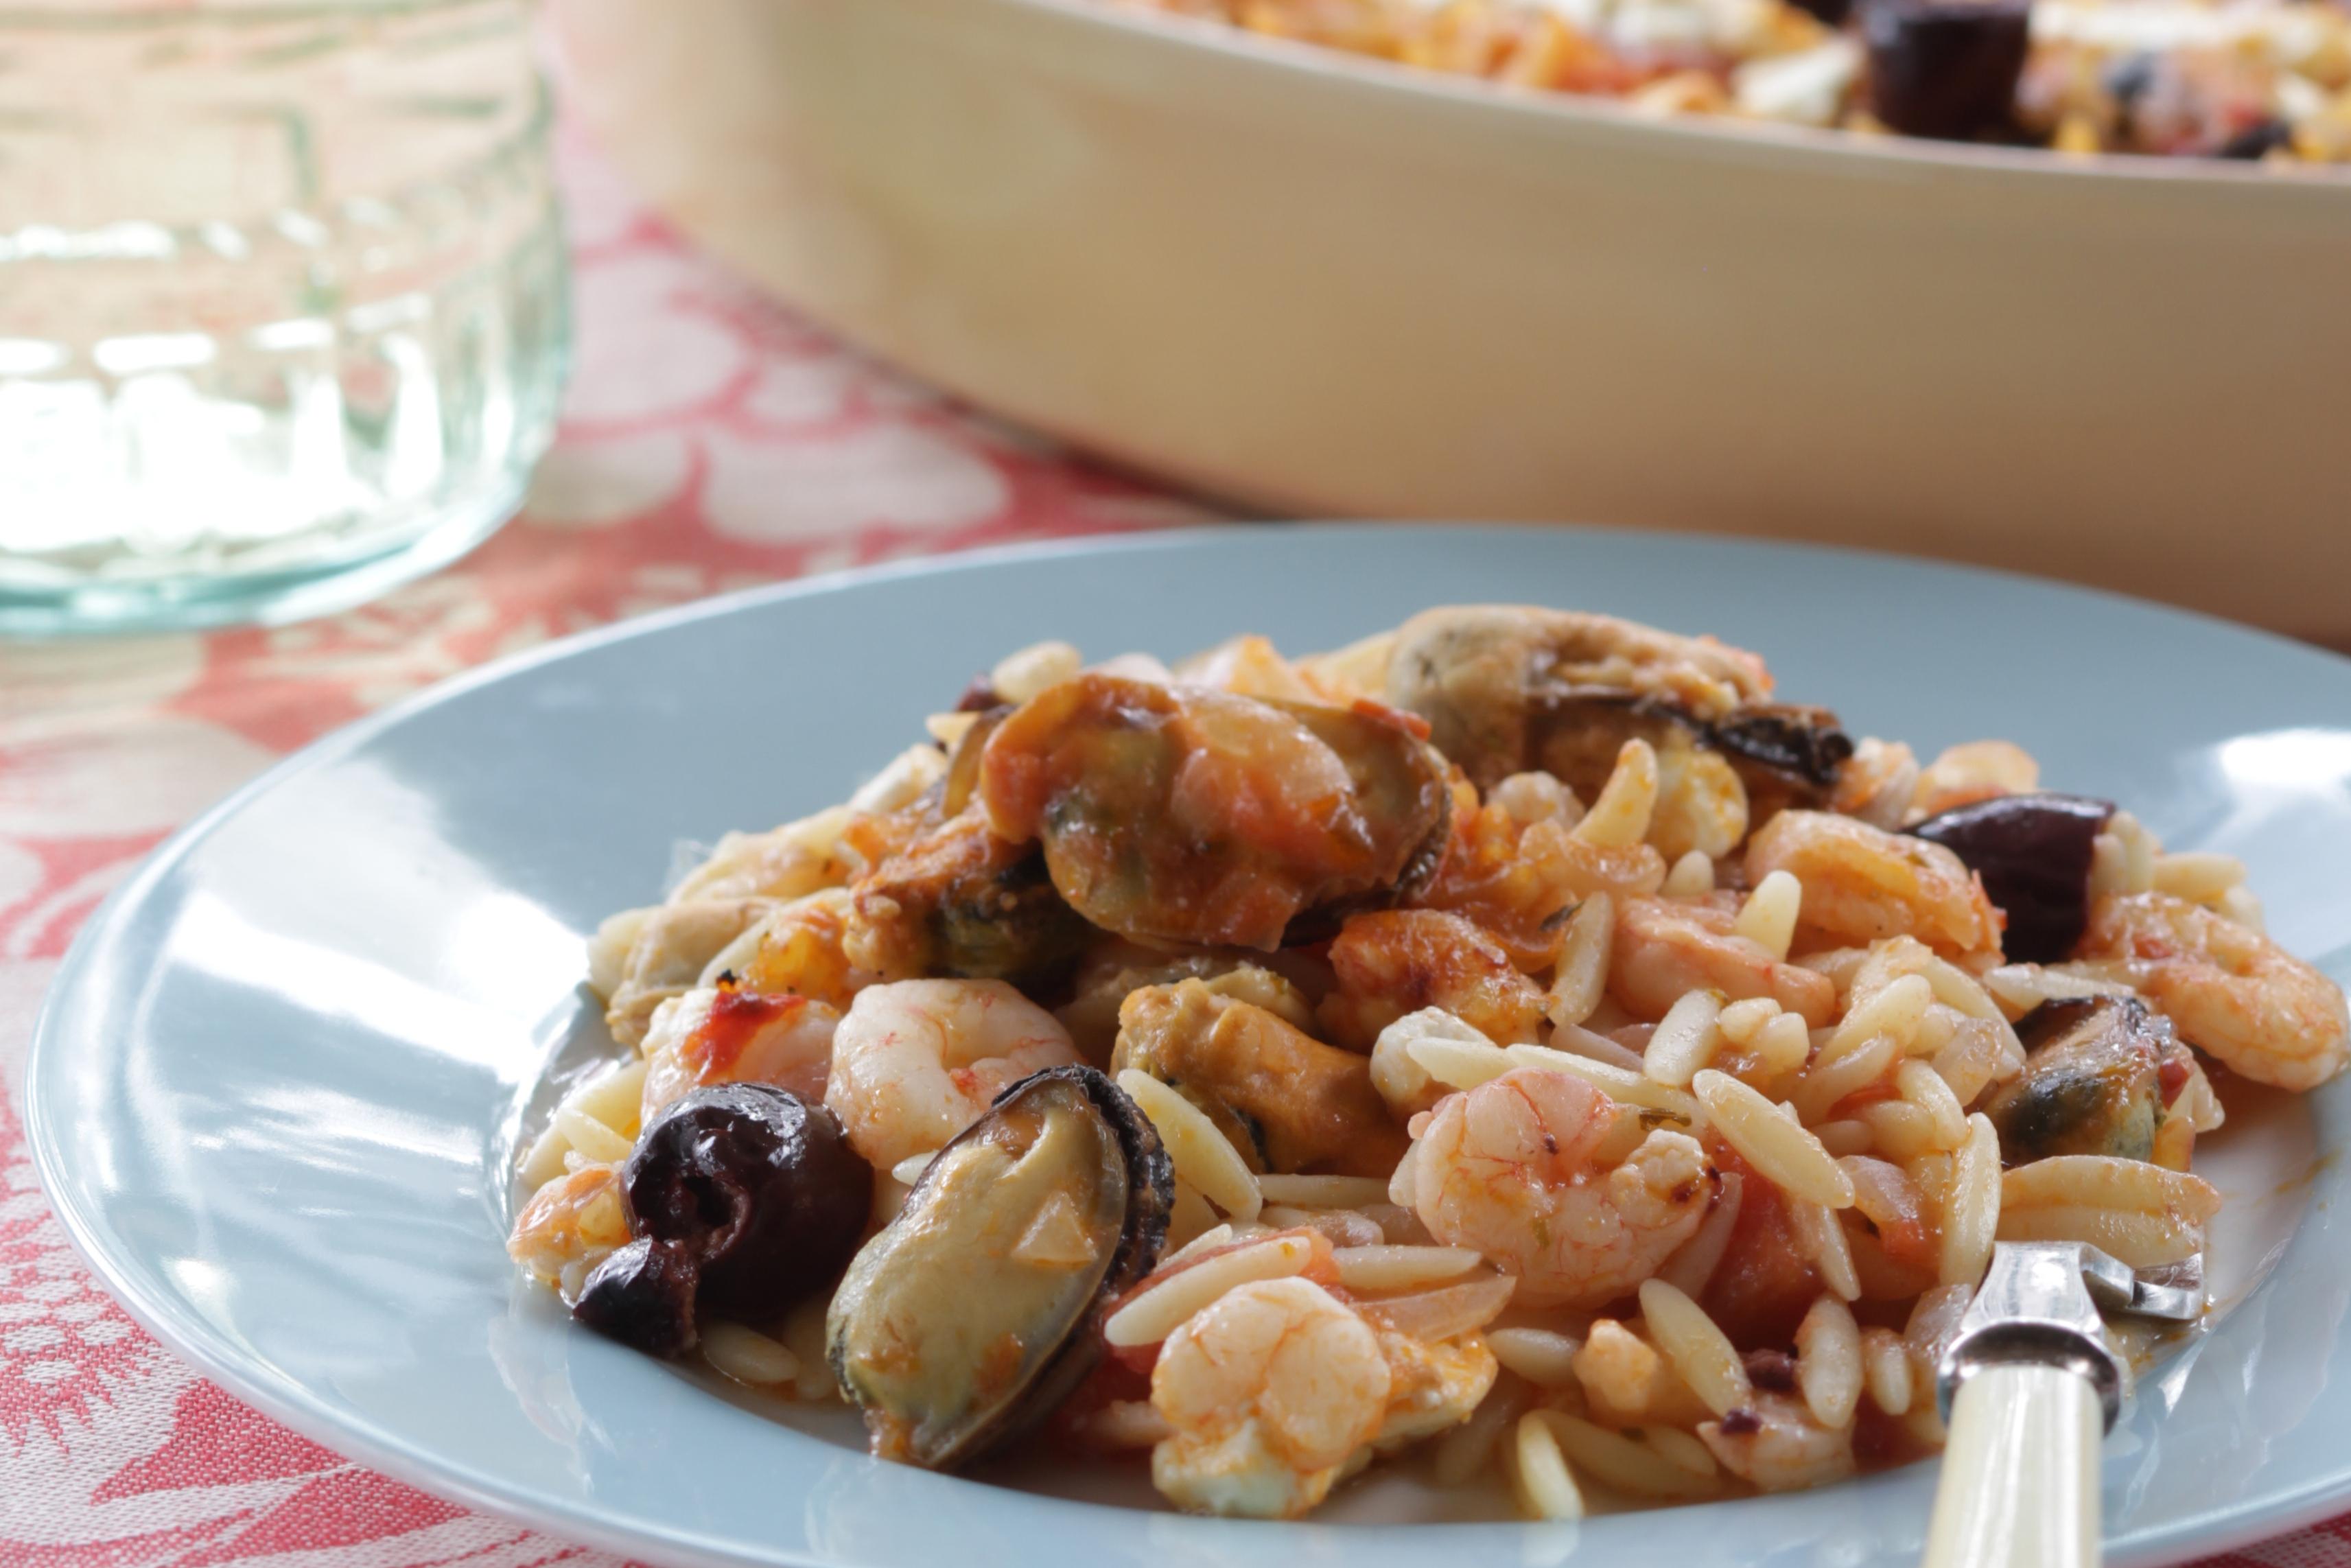 Baked-Seafood-Orzo-with-Kalamata-Olives